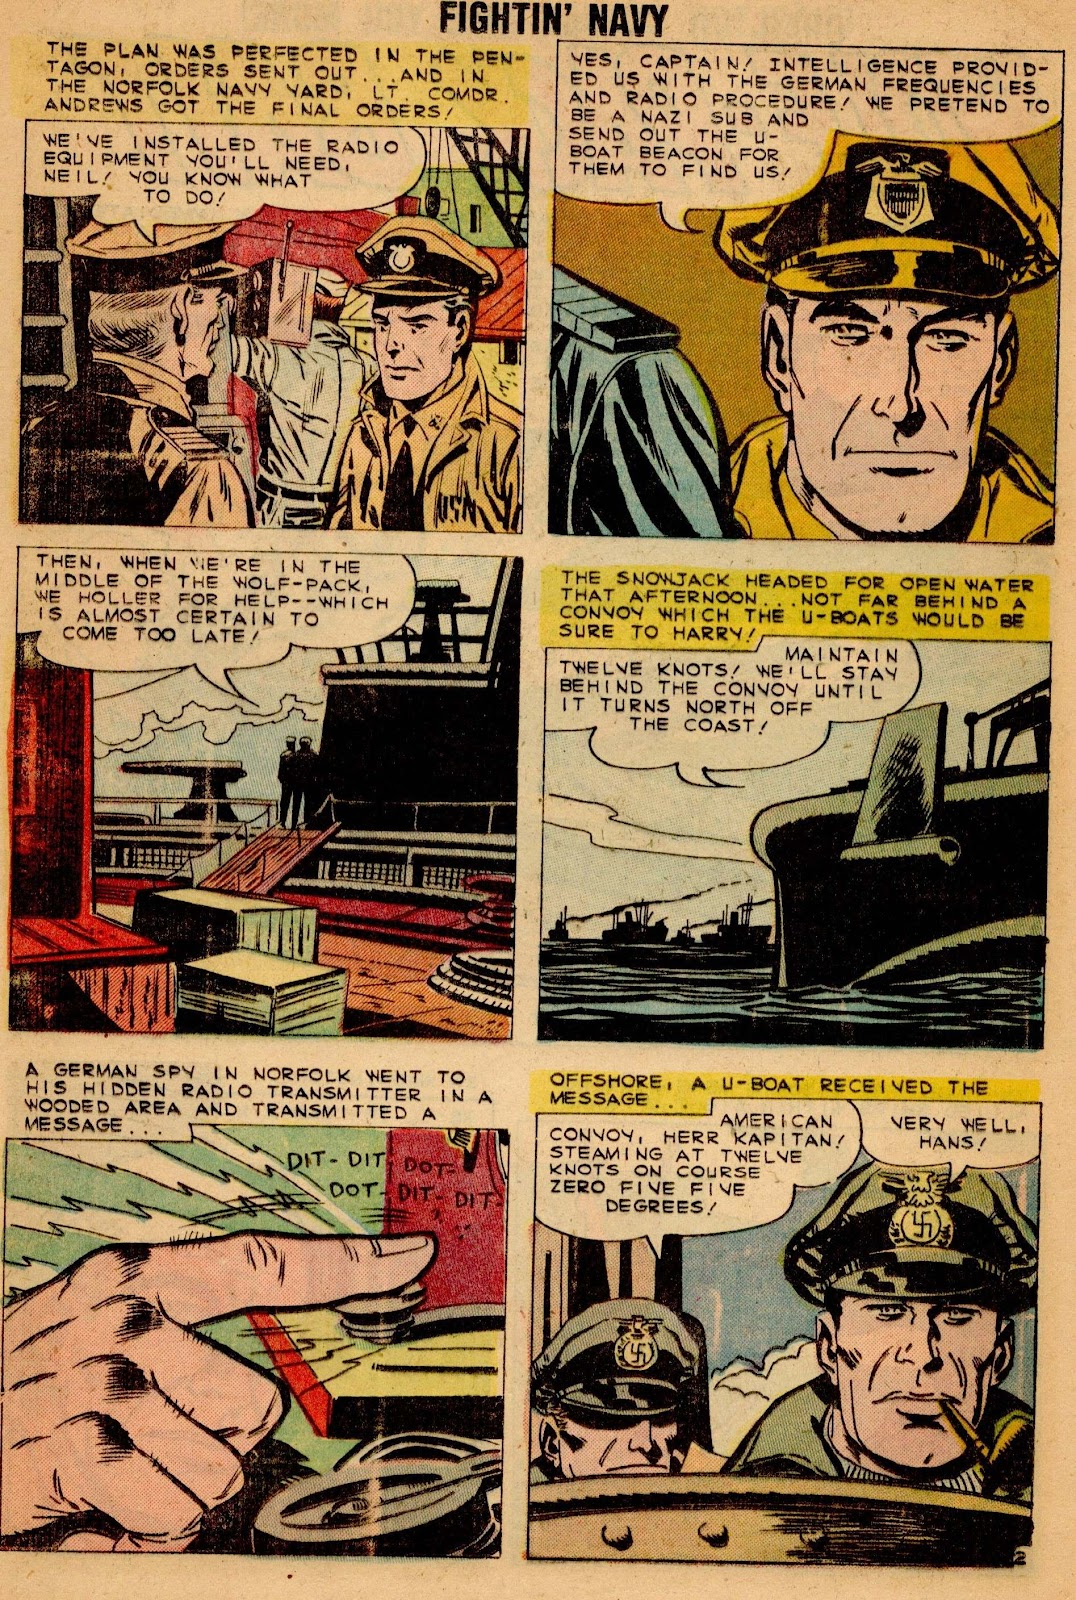 Read online Fightin' Navy comic -  Issue #90 - 20